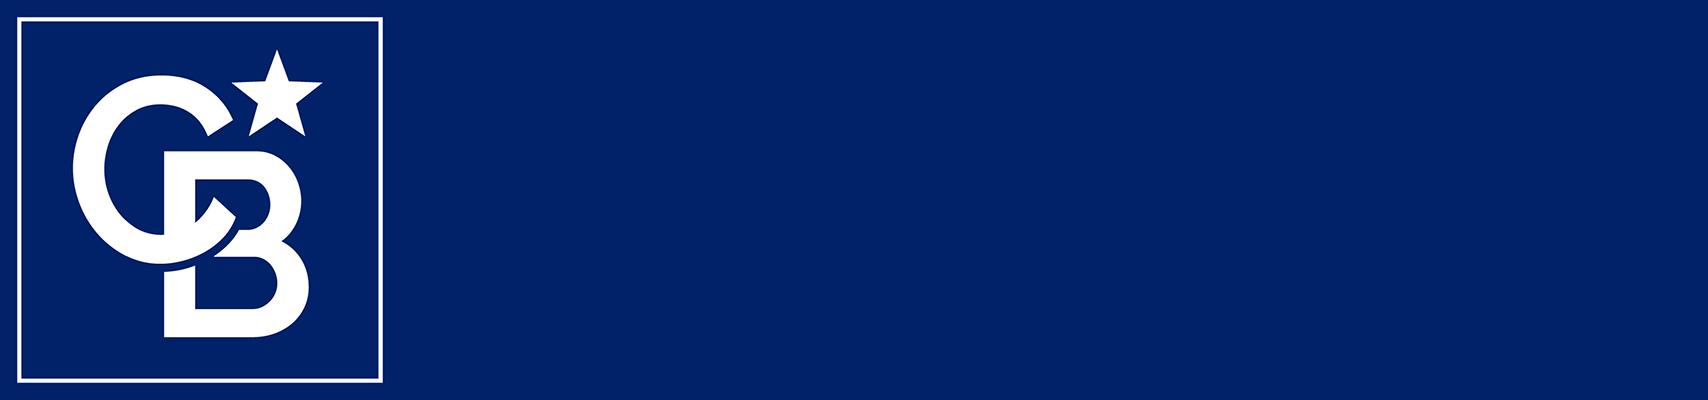 Casey House - Coldwell Banker Advantage Logo